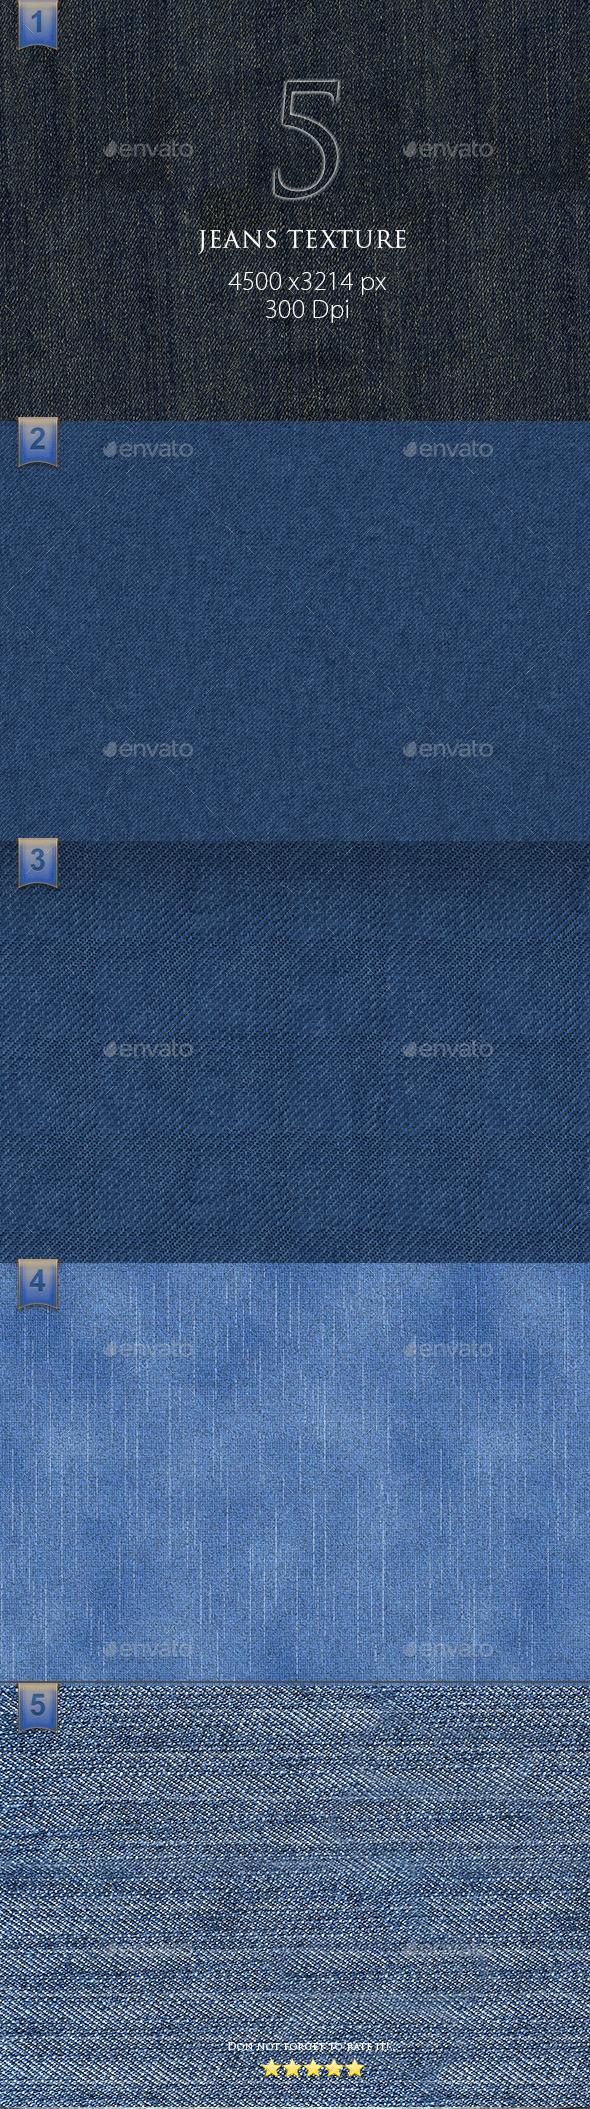 5 Jeans Texture - Textures